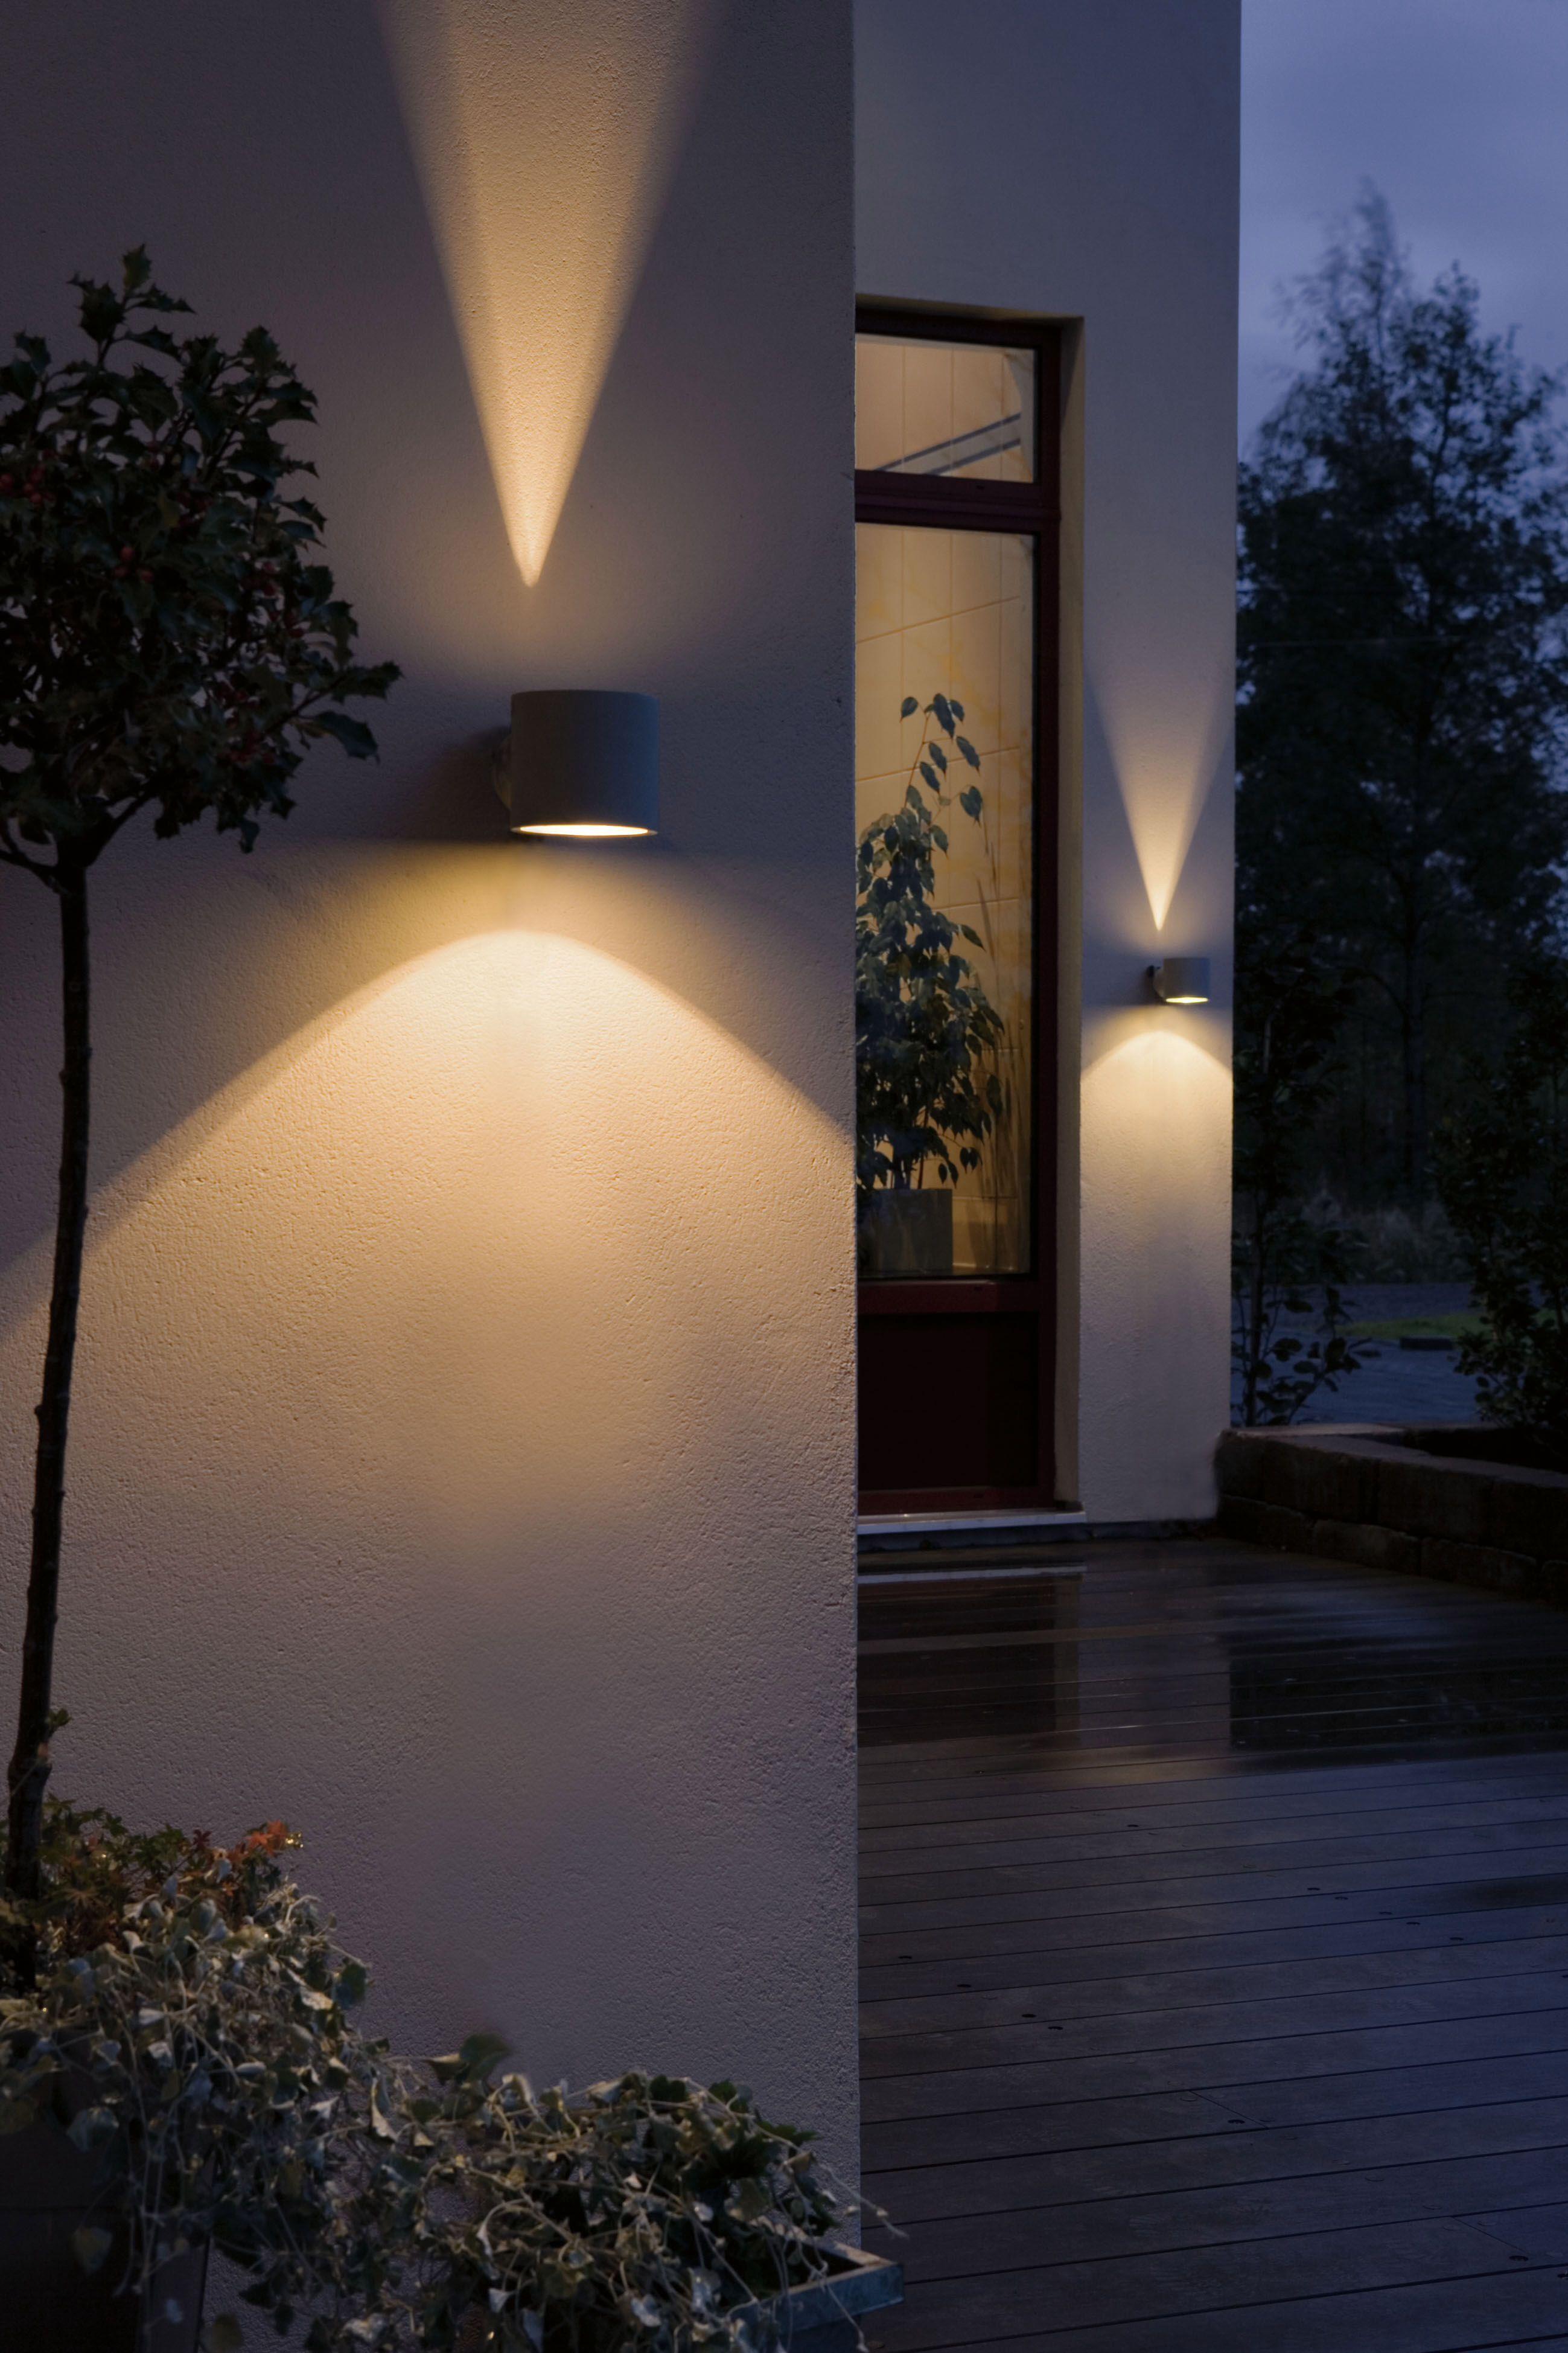 30 Diy Lighting Ideas At Night Yard Landscape With Outdoor Lights Landscapelightingdesign Before You Get In In 2020 Beleuchtungsideen Beleuchtung Fassadenbeleuchtung